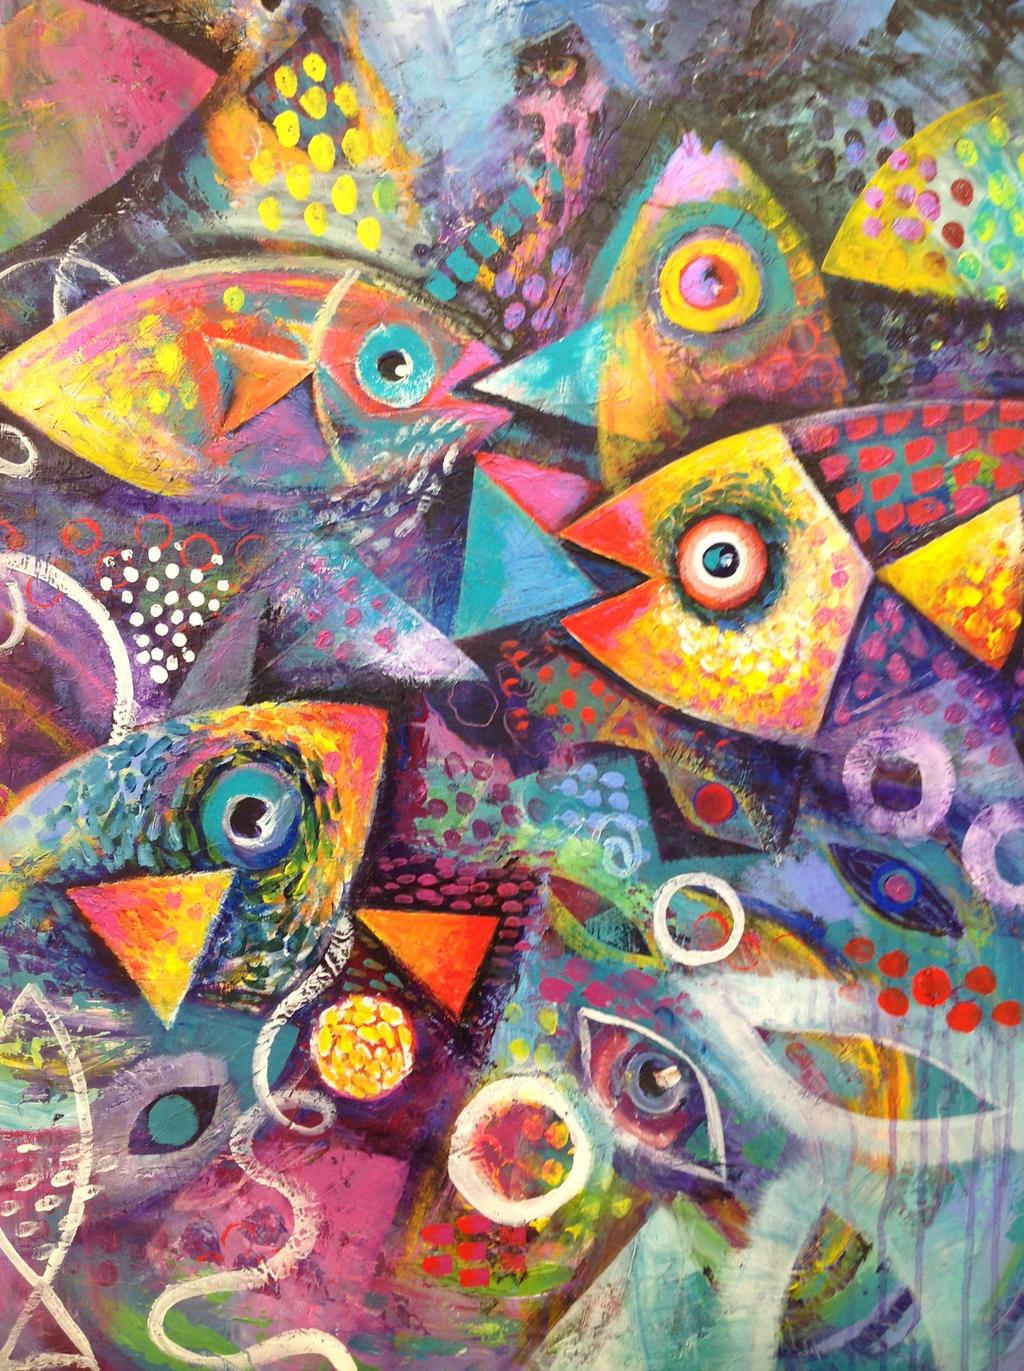 New Fish Painting By Karincharlotte